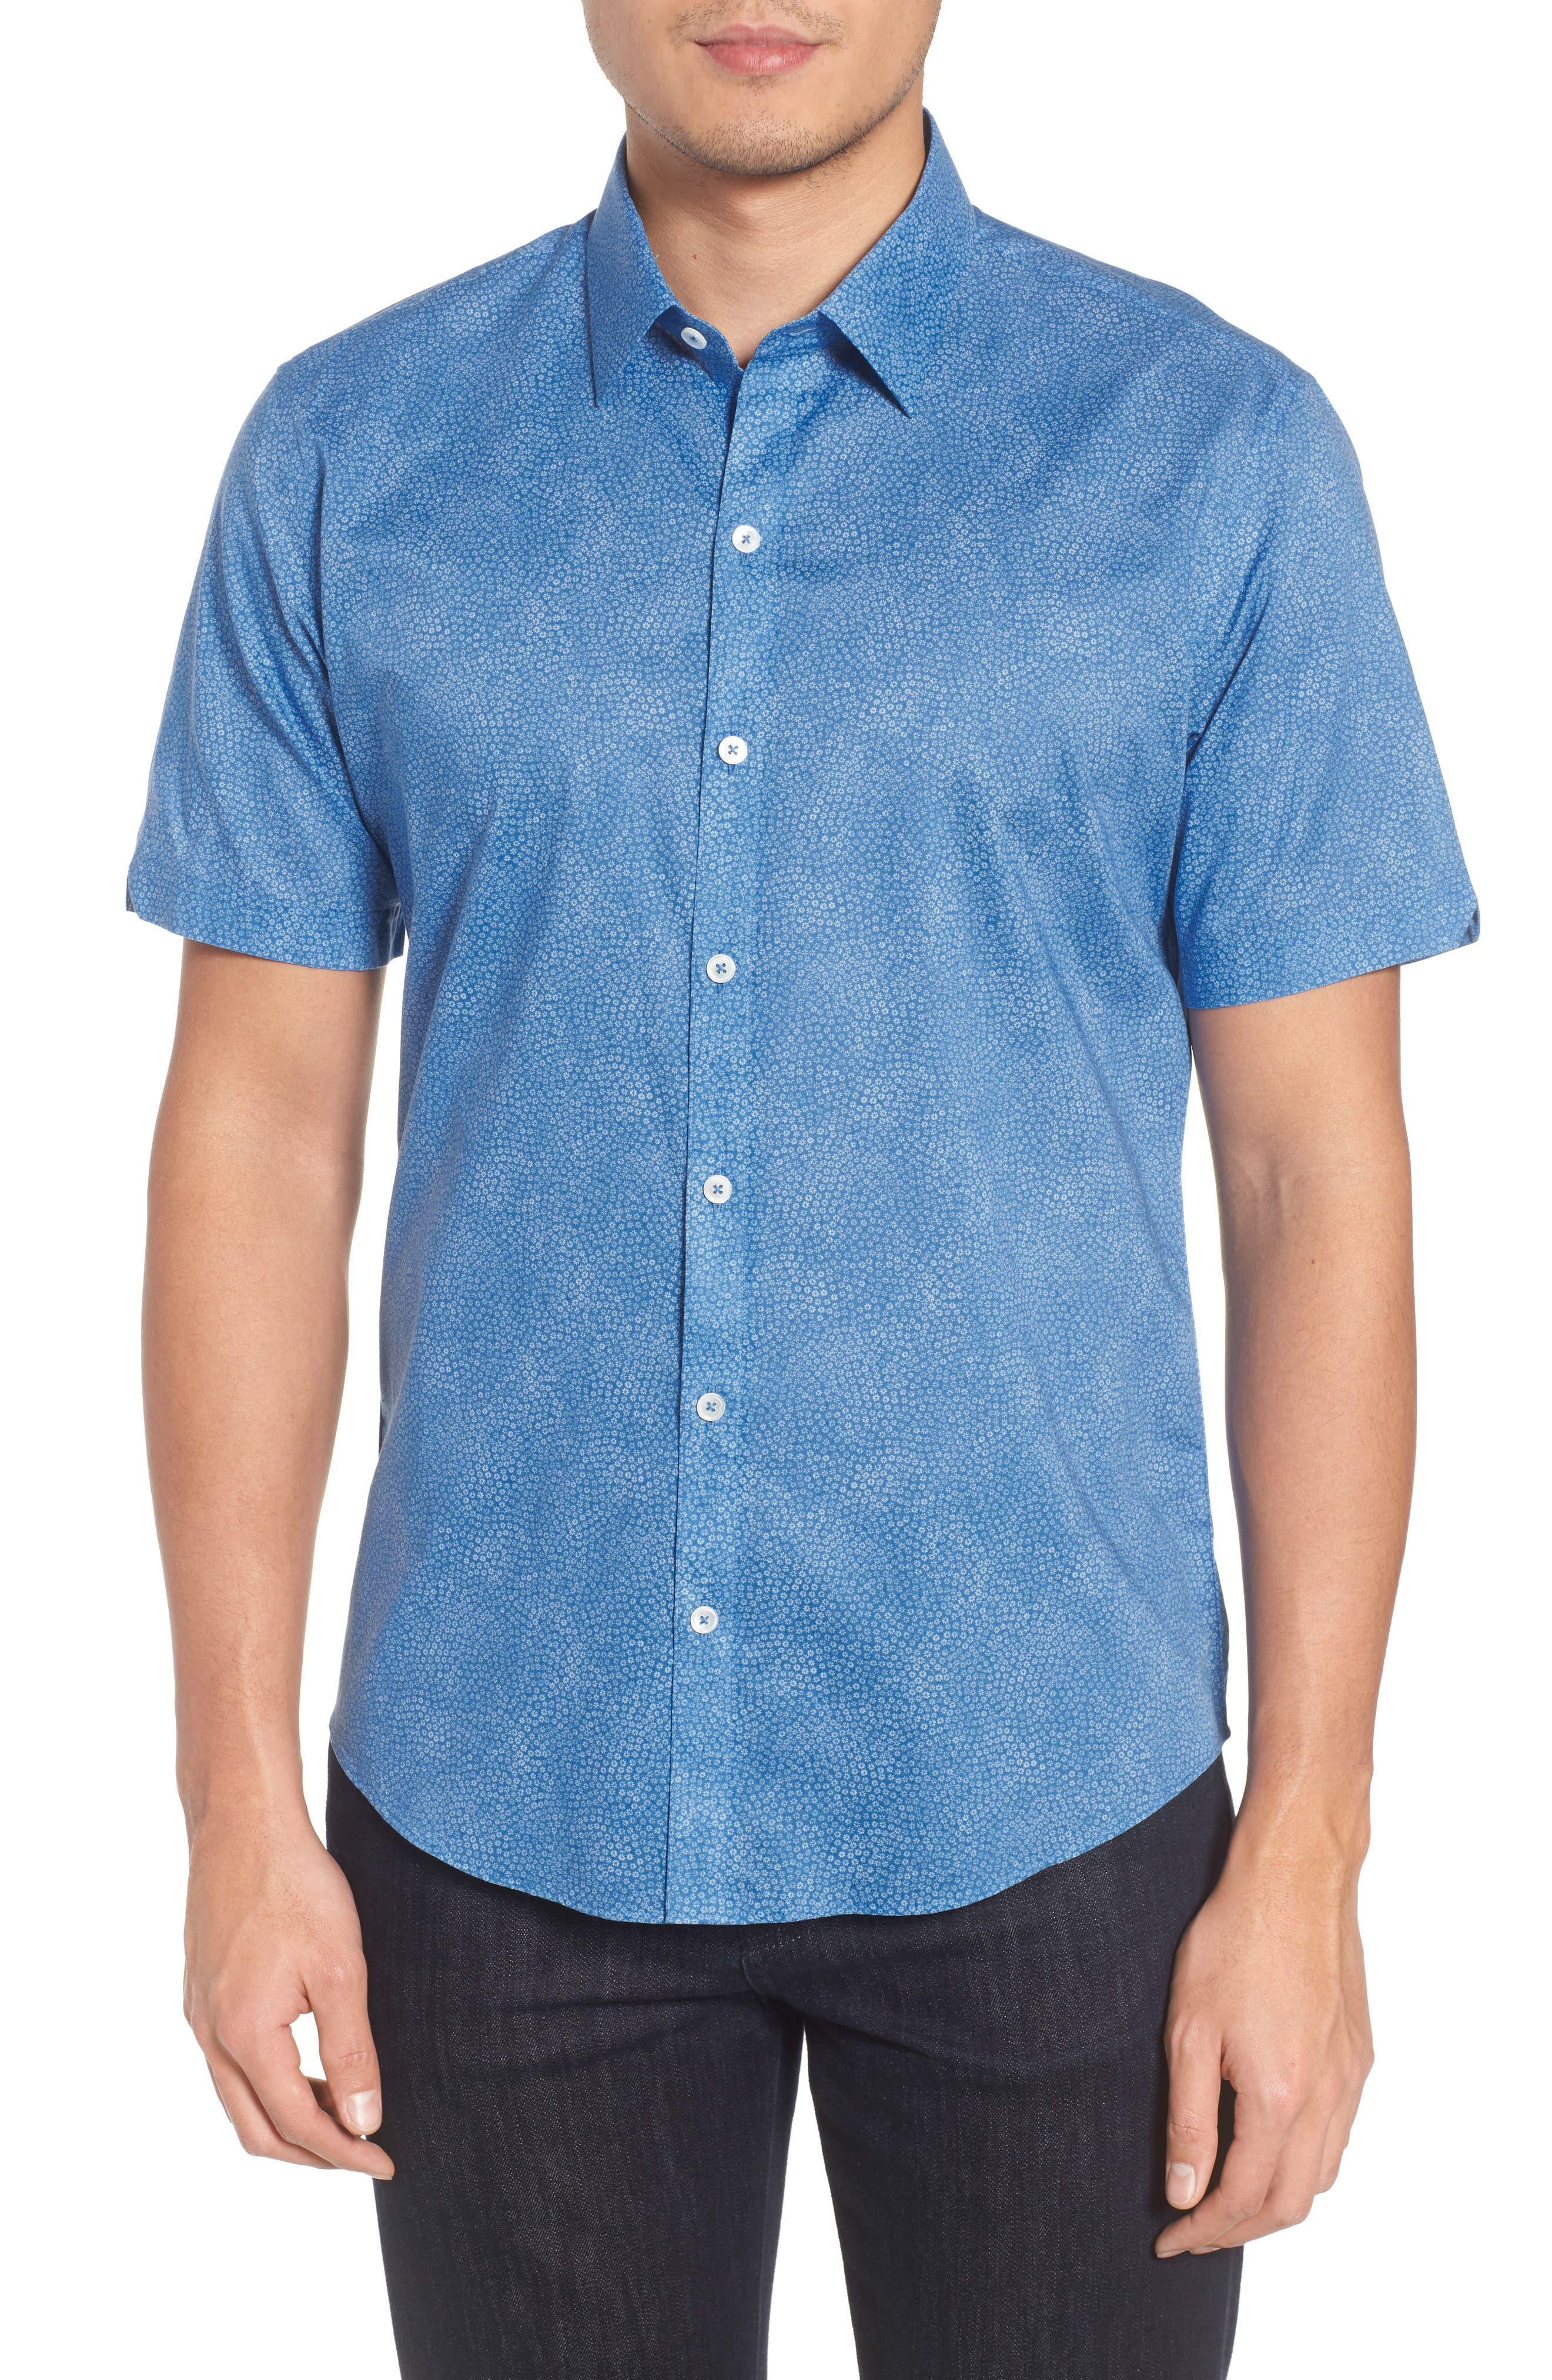 Siguenza Floral Short Sleeve Sport Shirt,                         Main,                         color, 400